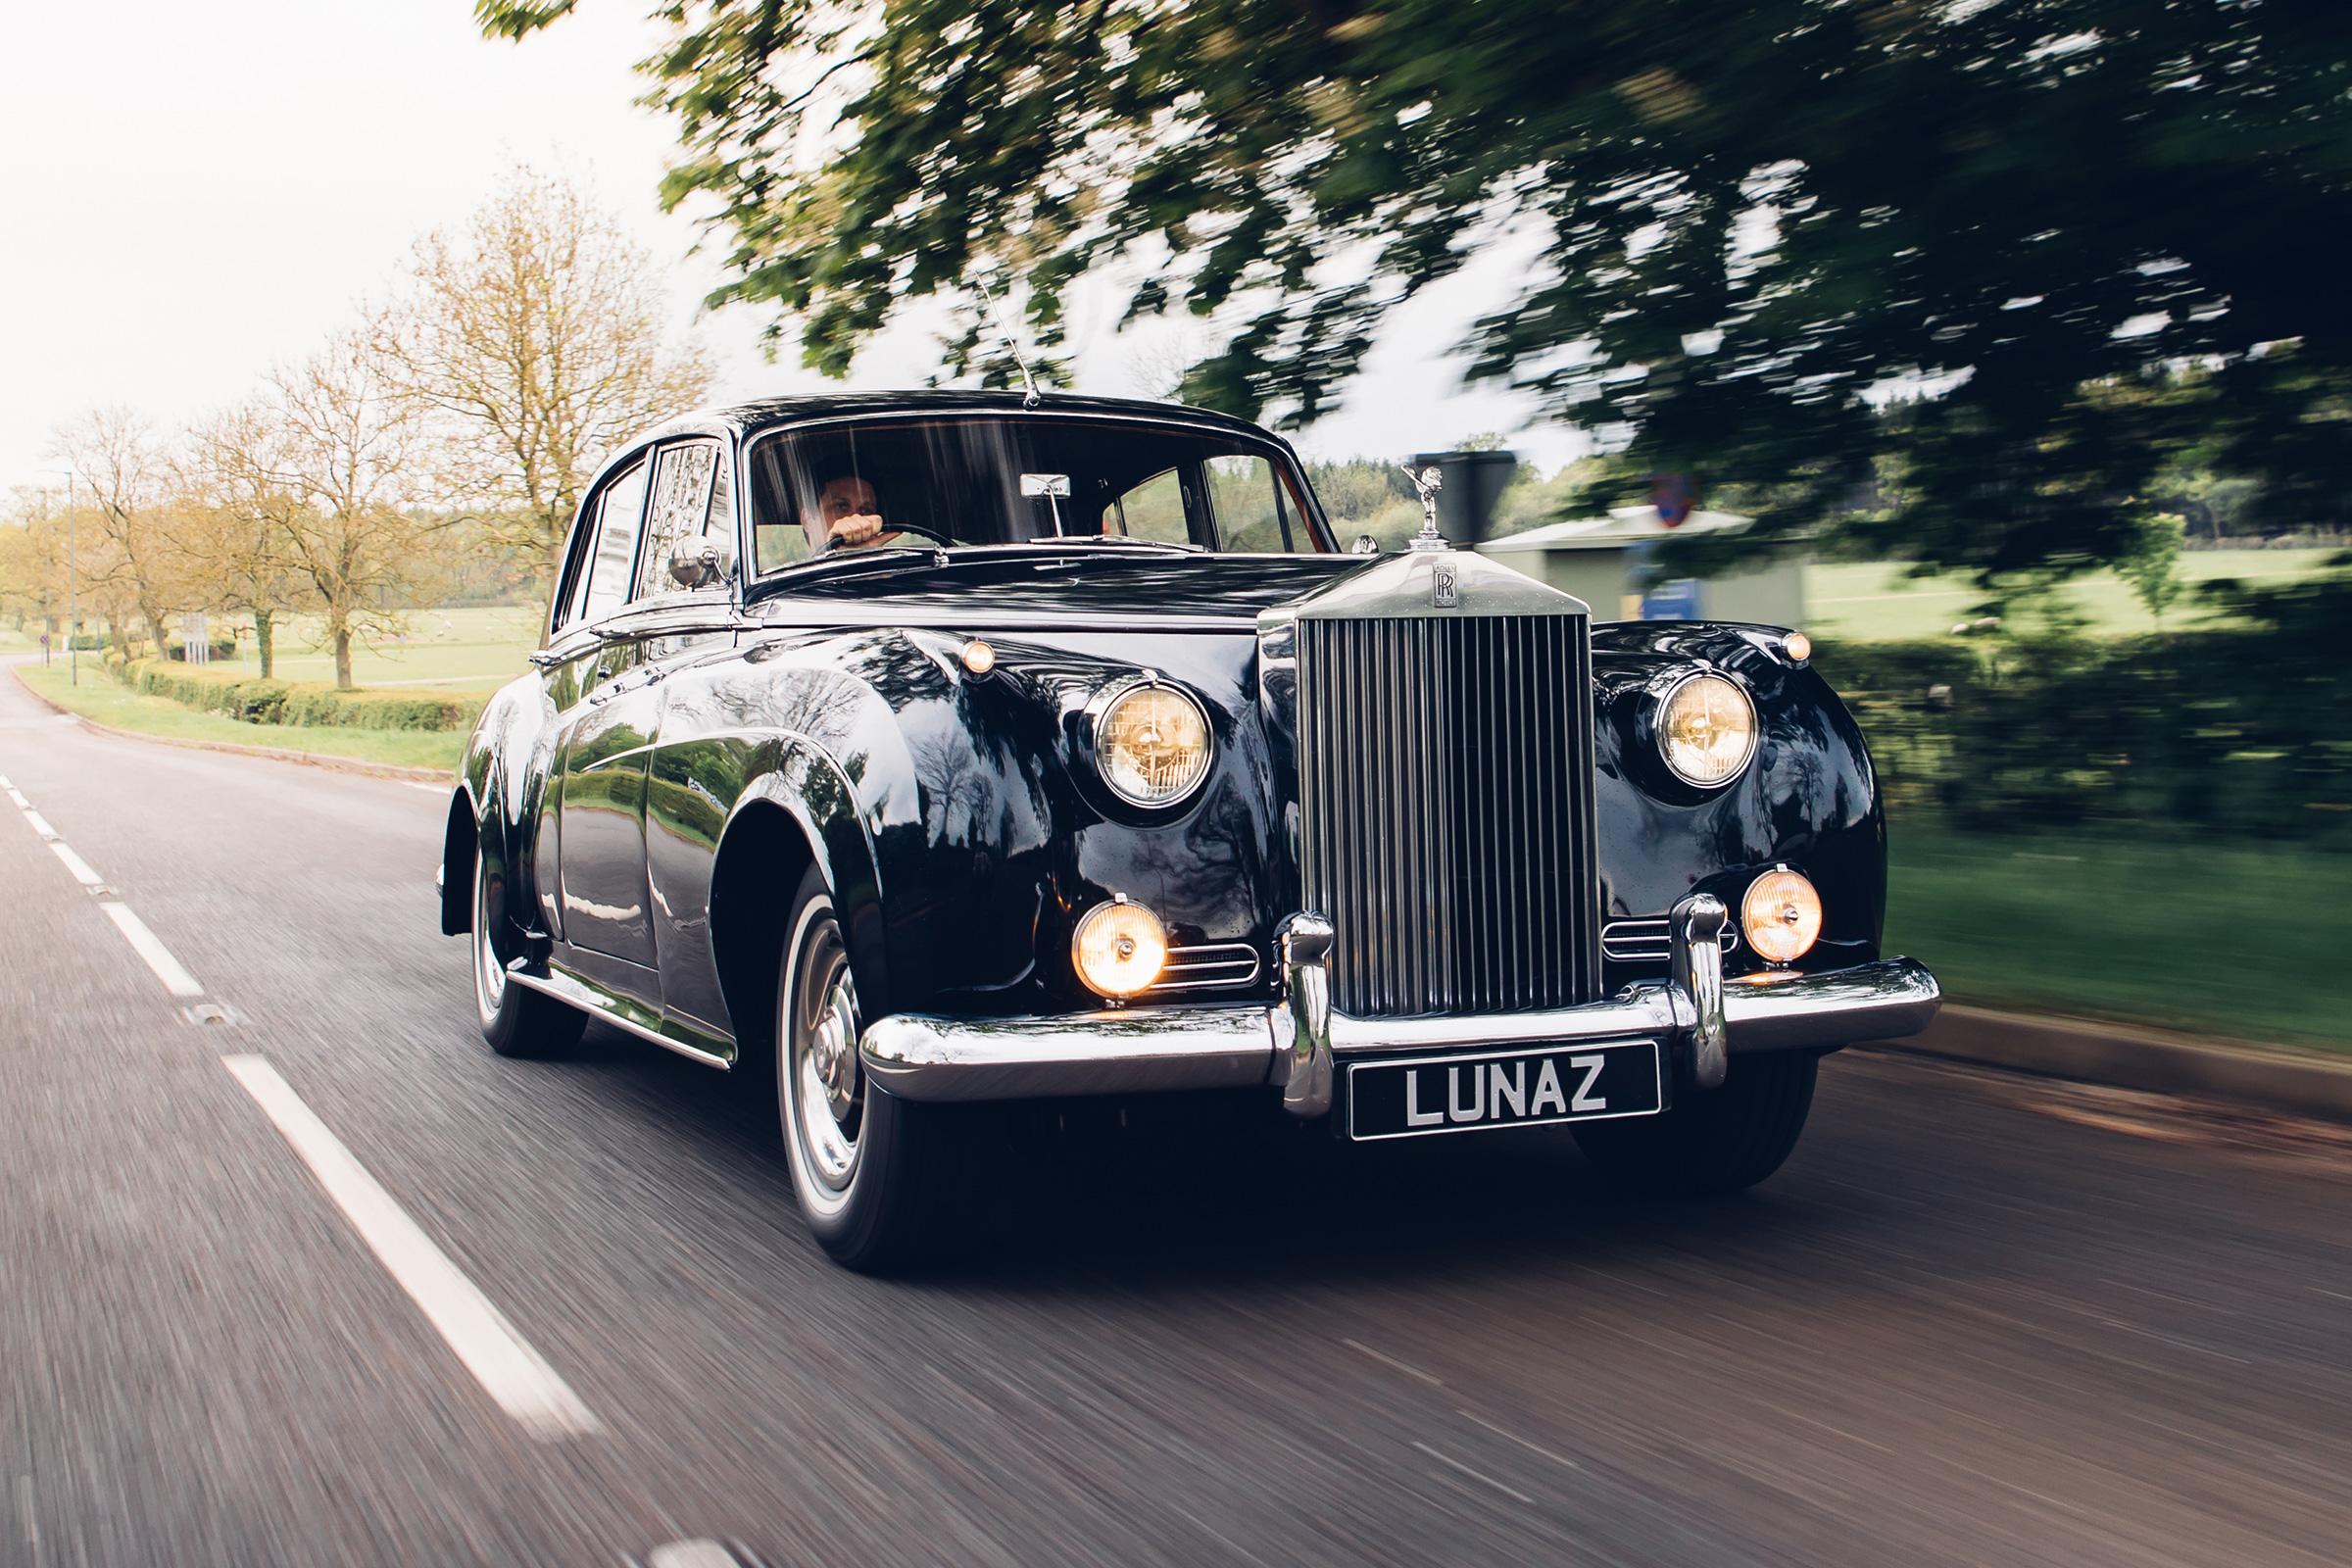 Lunaz electric classic cars | Auto Express